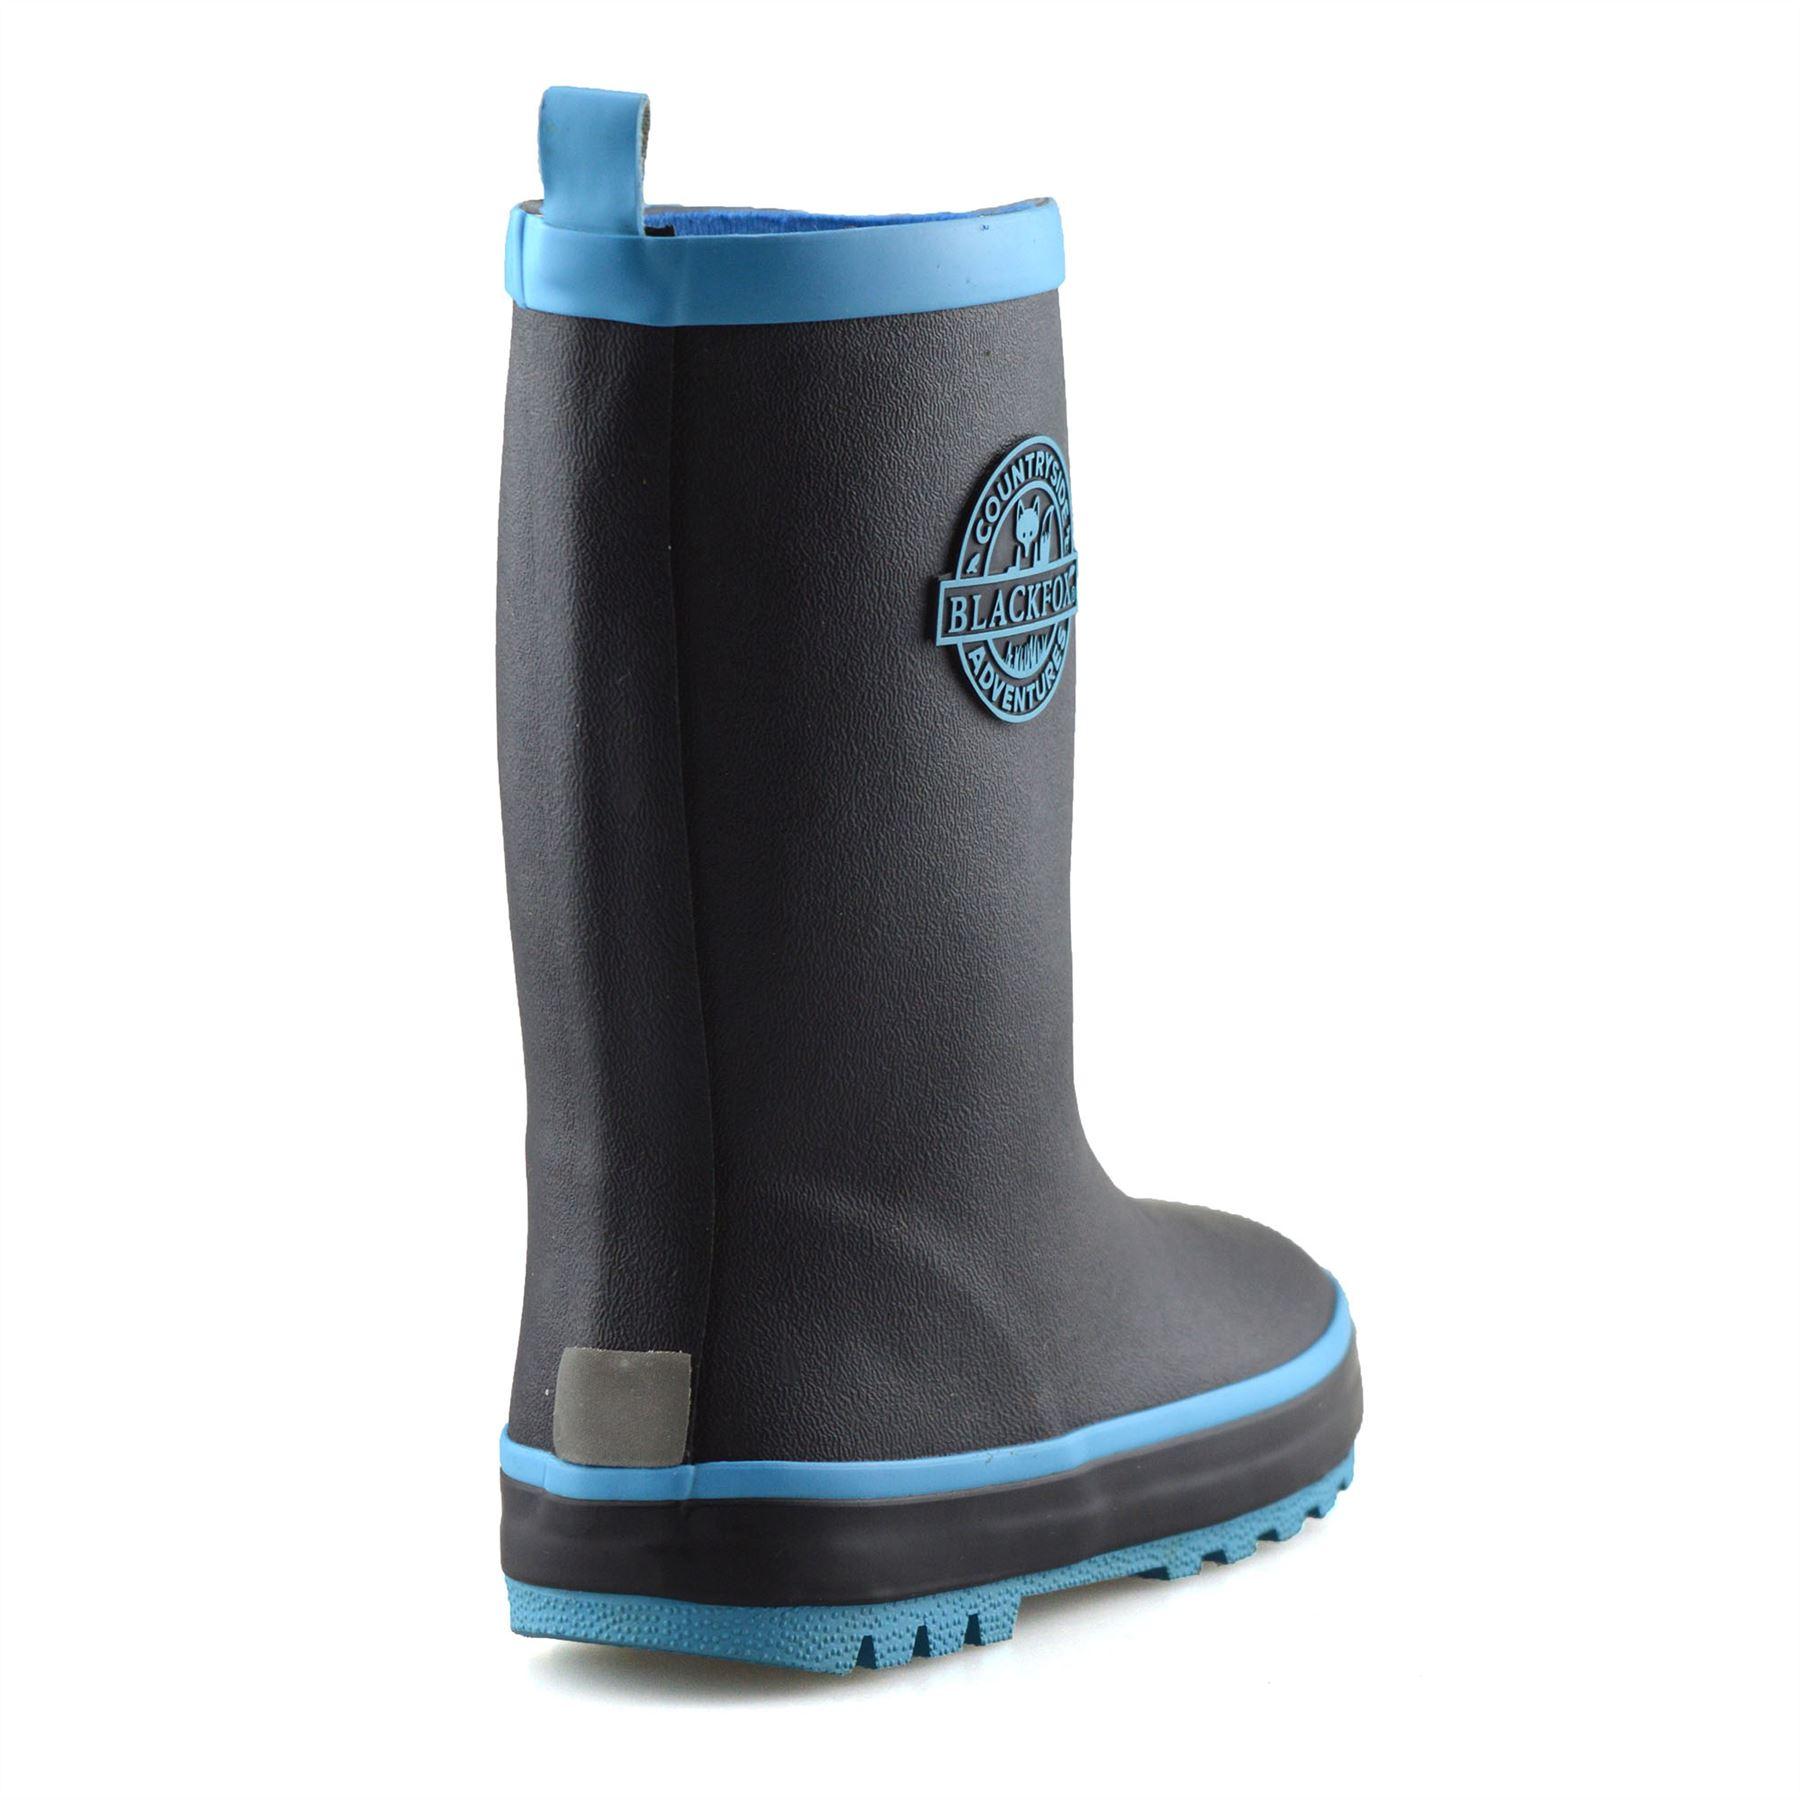 Boys Girls Kids Waterproof Wellies Winter Rain Snow Wellingtons Boots Shoes Size